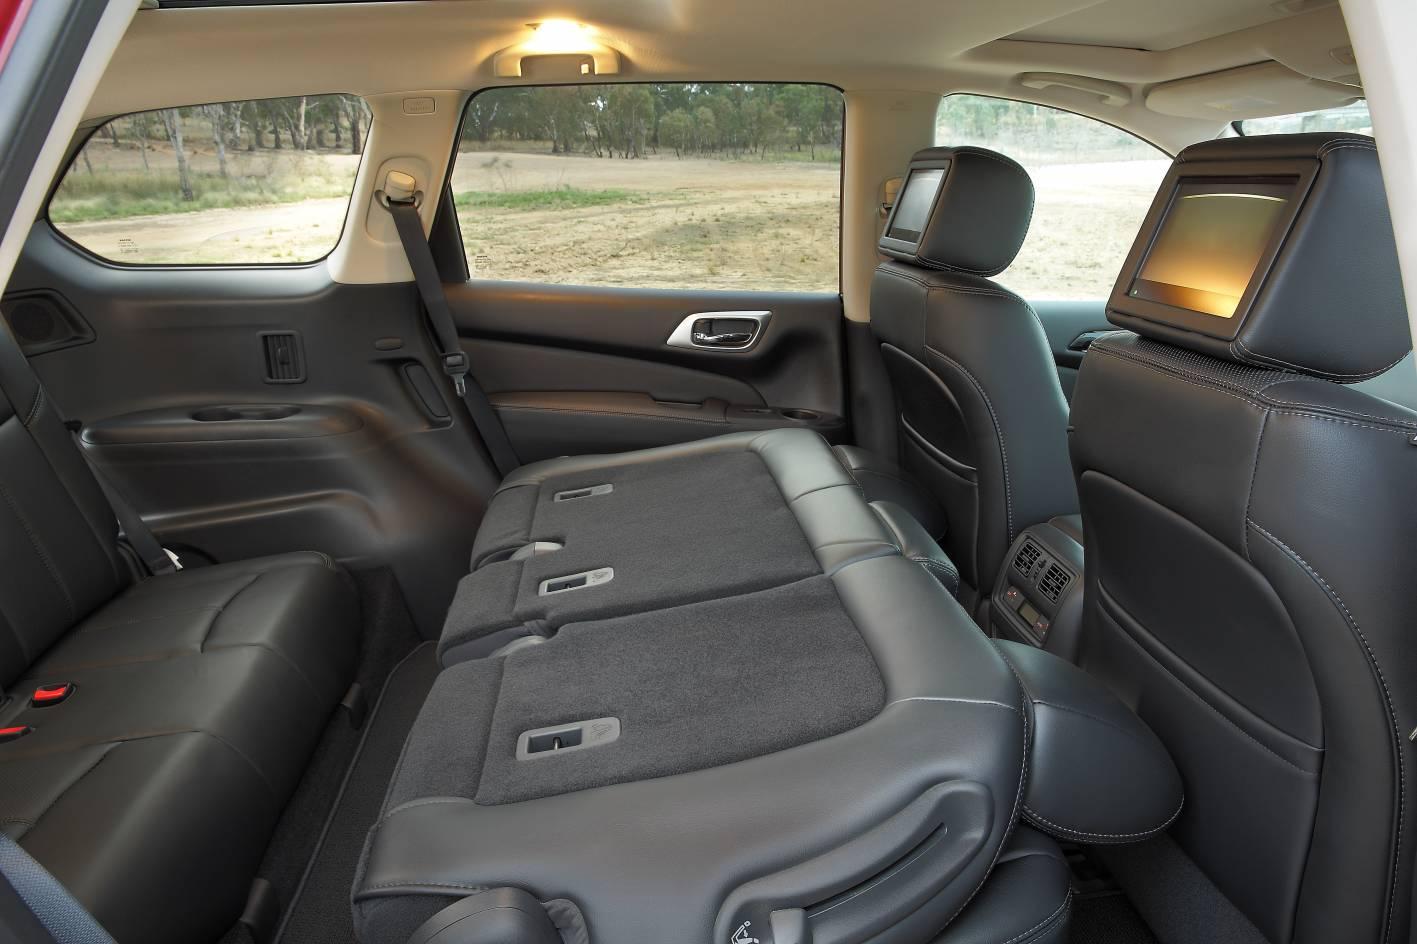 2017 Nissan Pathfinder Third Row Seats